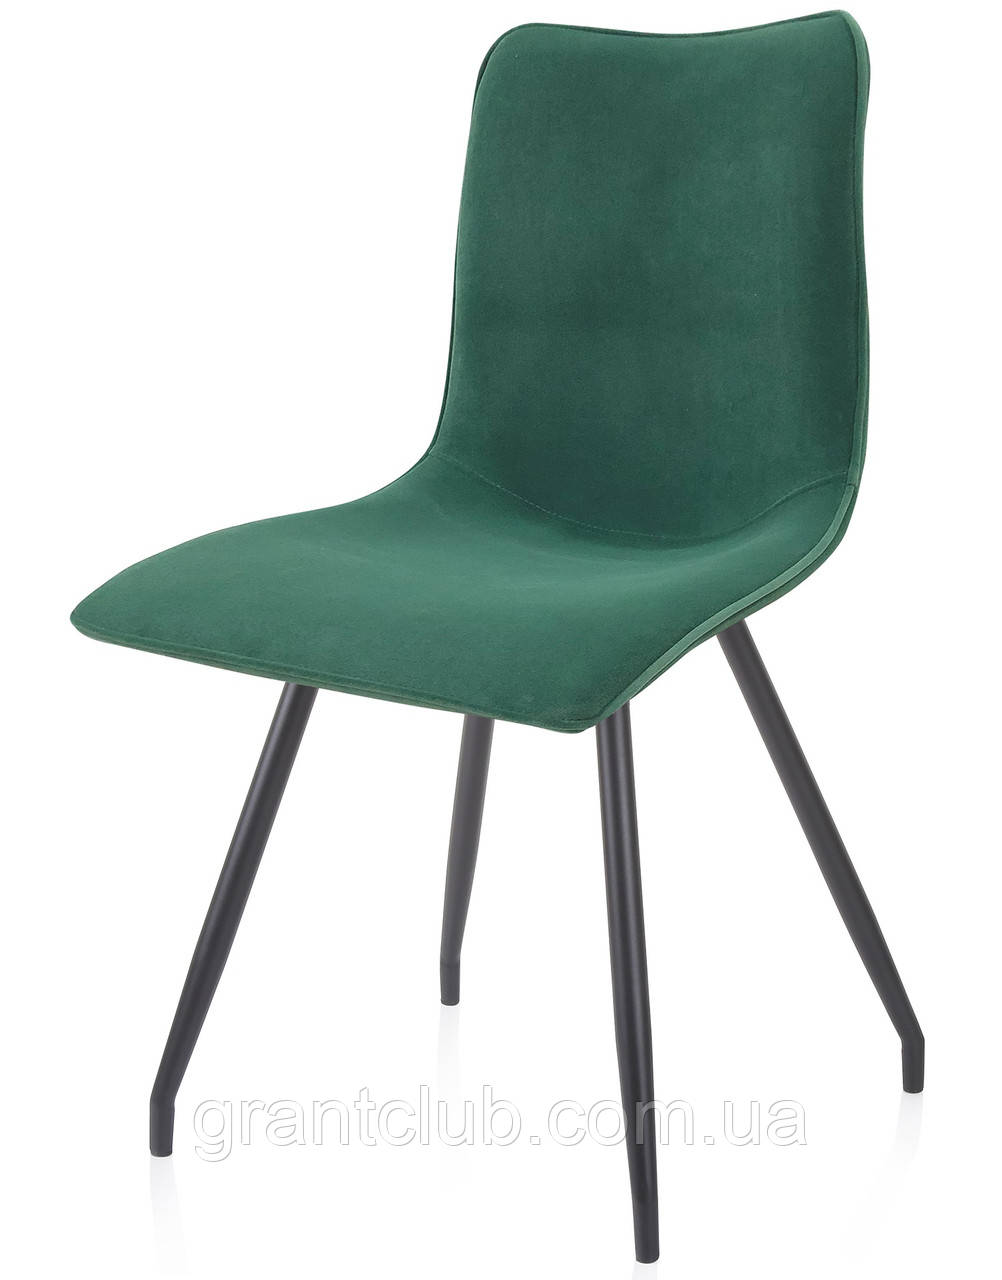 Мягкий стул N-76 тёмно-зелёный вельвет Vetro Mebel